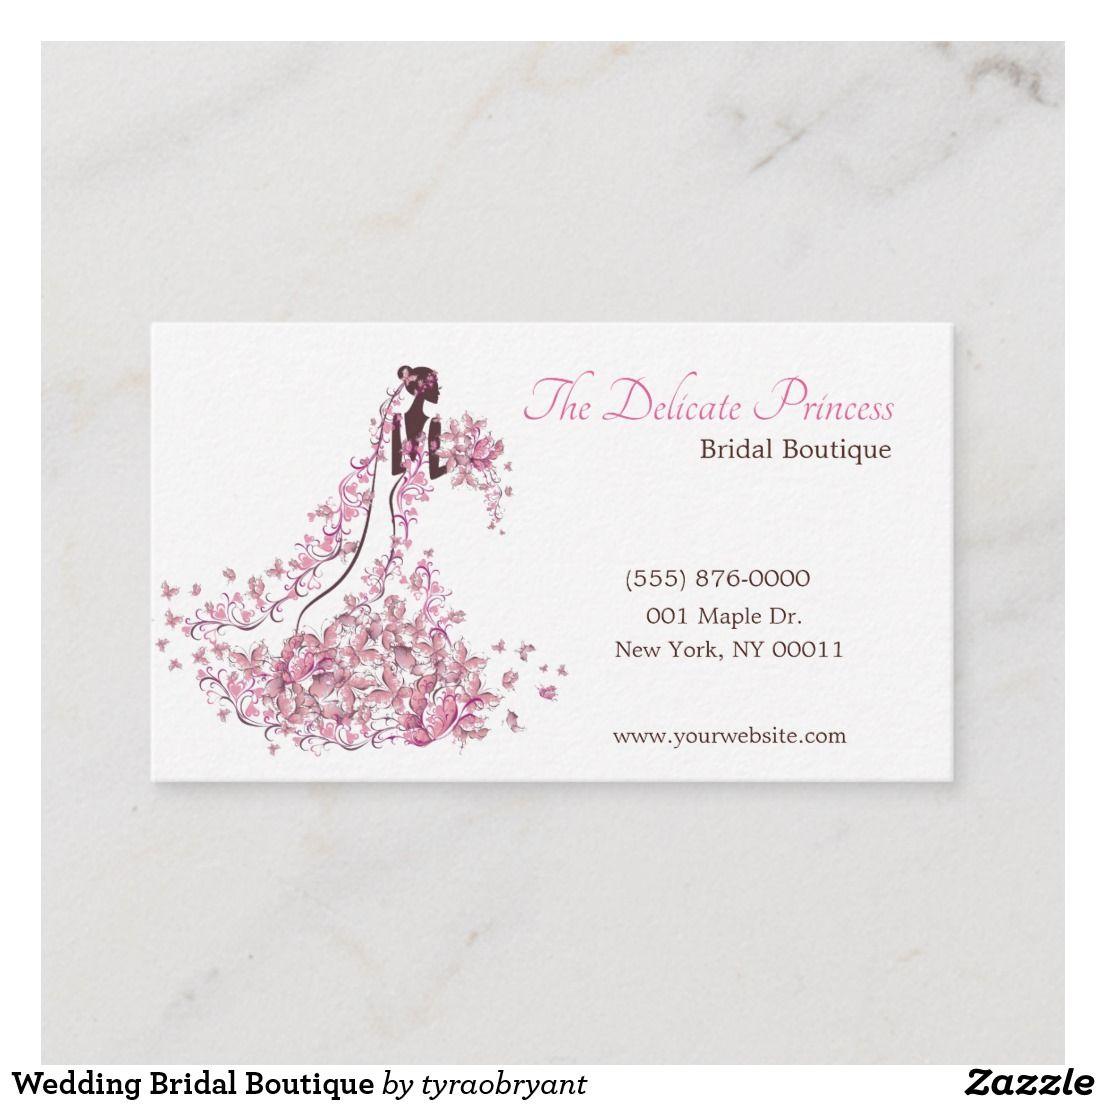 Wedding Bridal Boutique Business Card Zazzle Com In 2021 Boutique Business Cards Wedding Shop Wedding Cards Handmade